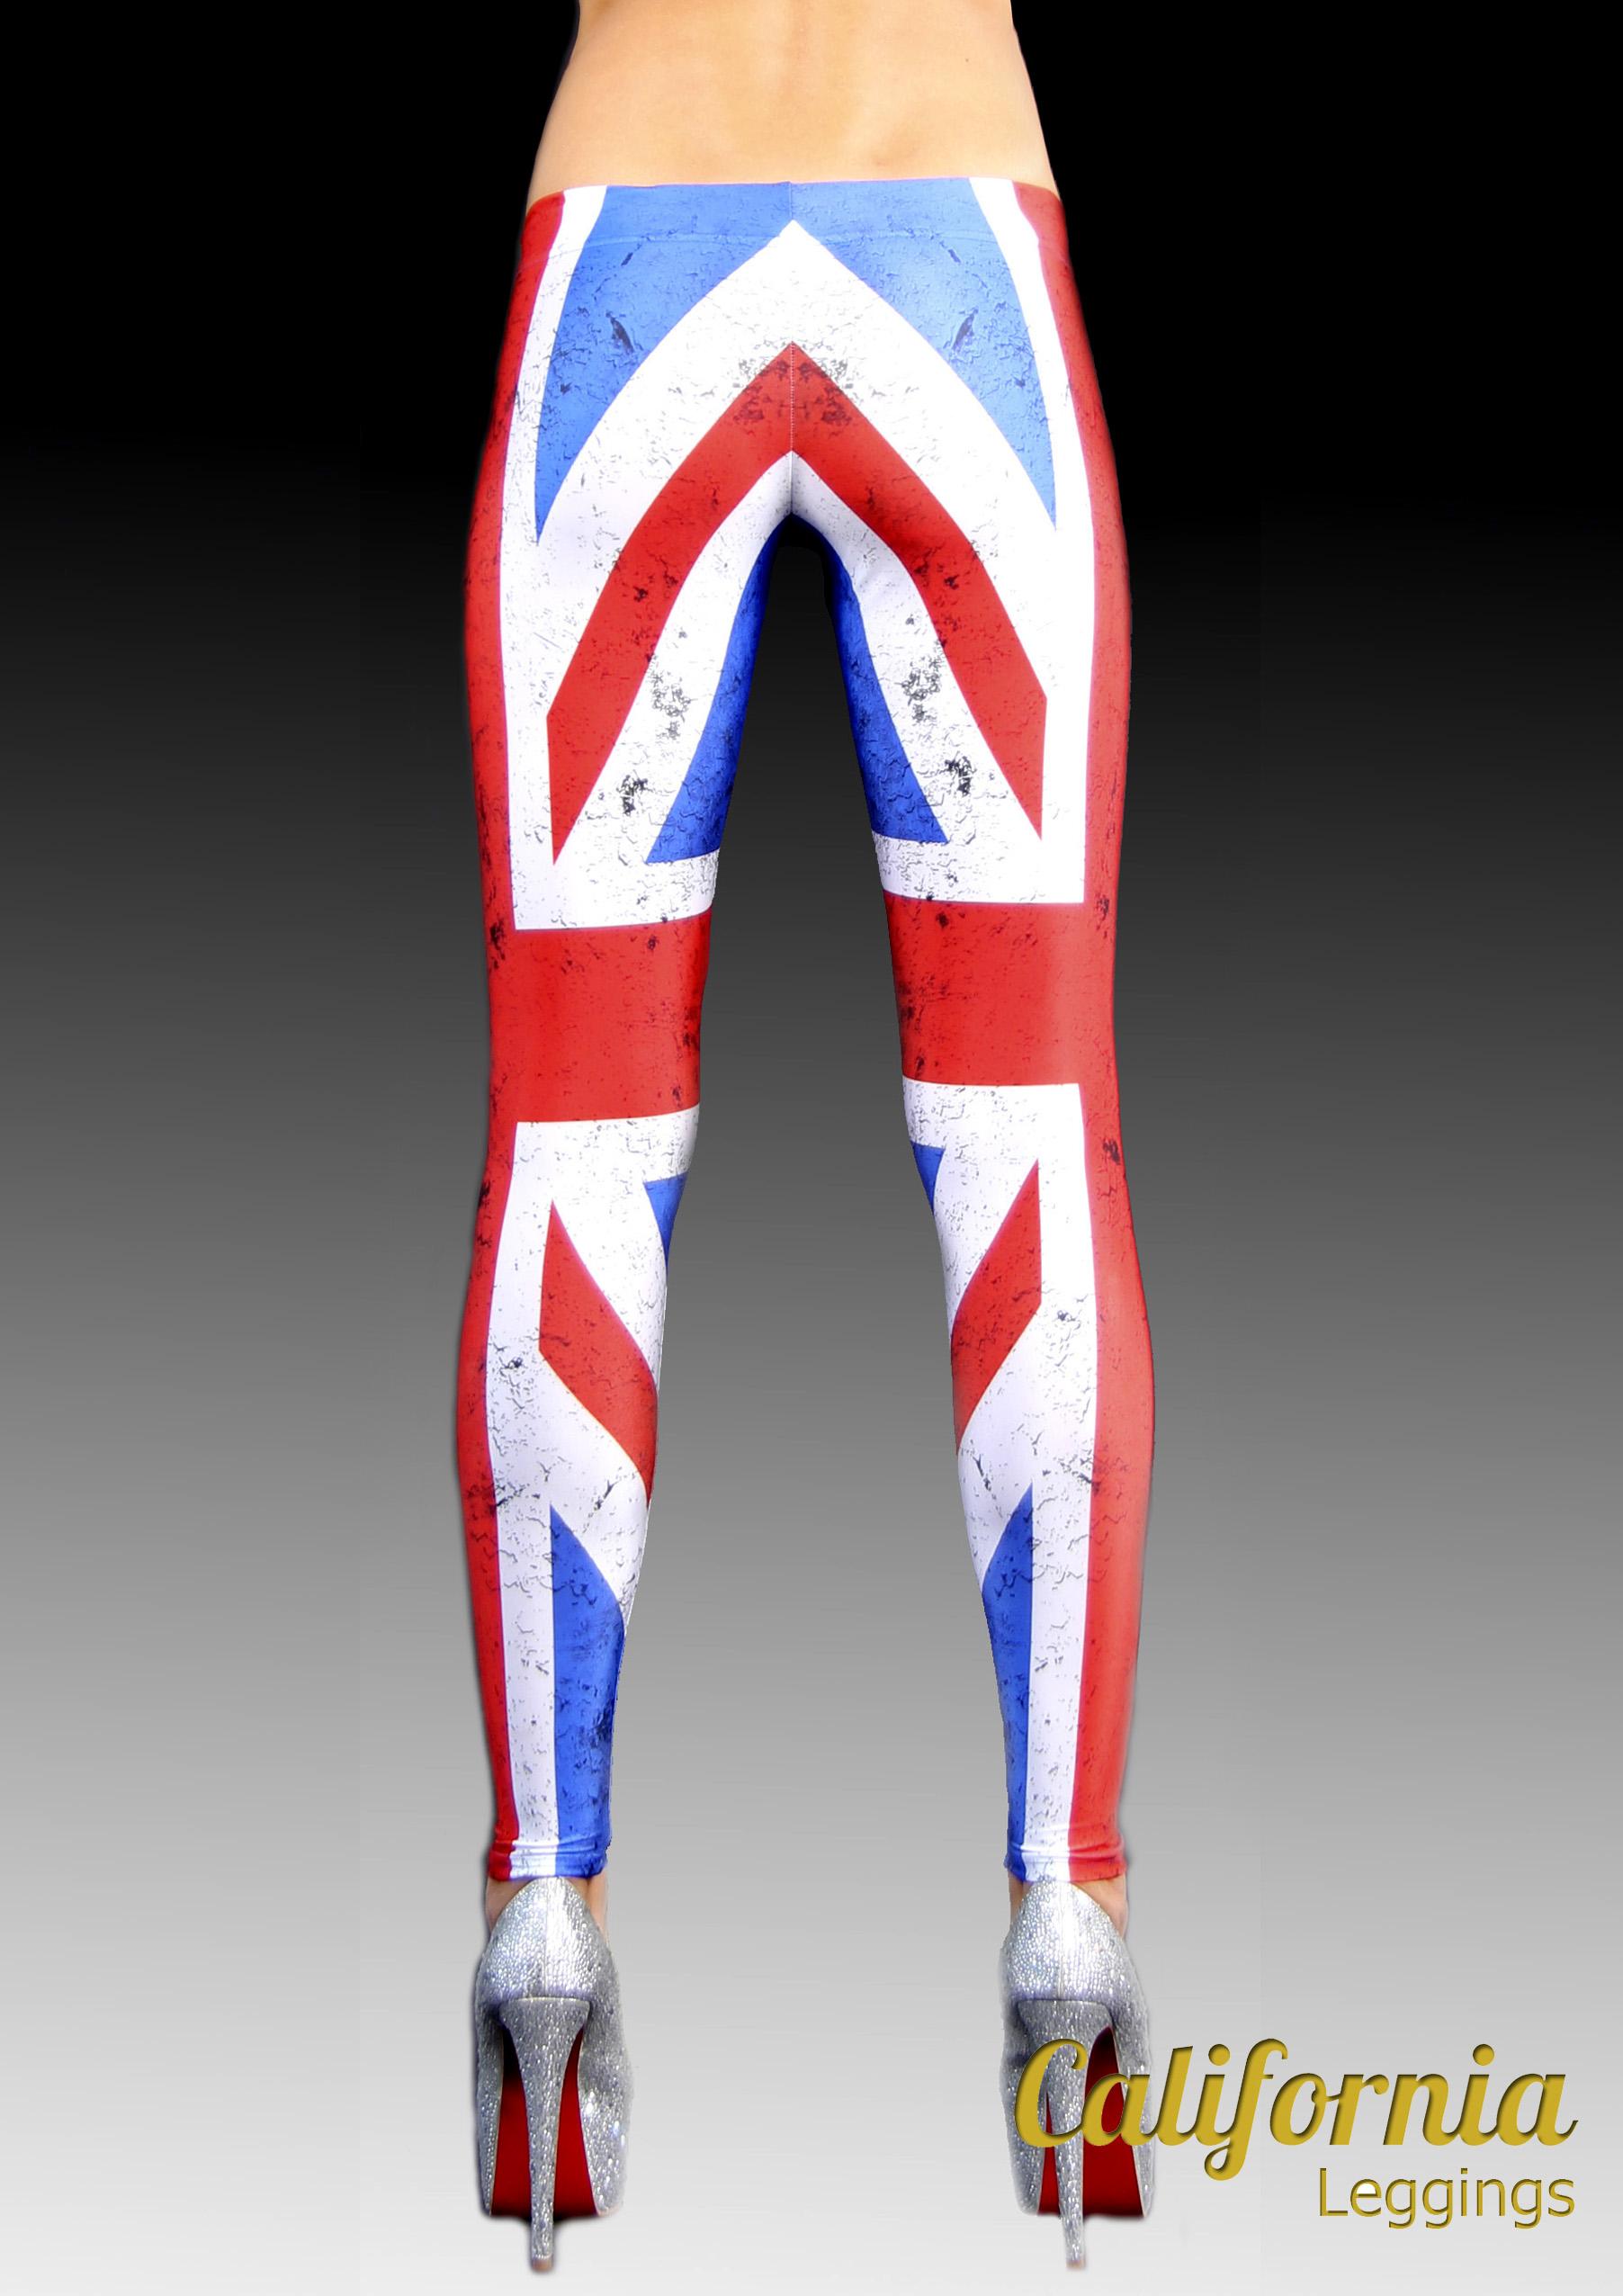 Леггинсы California Калифорния British flag